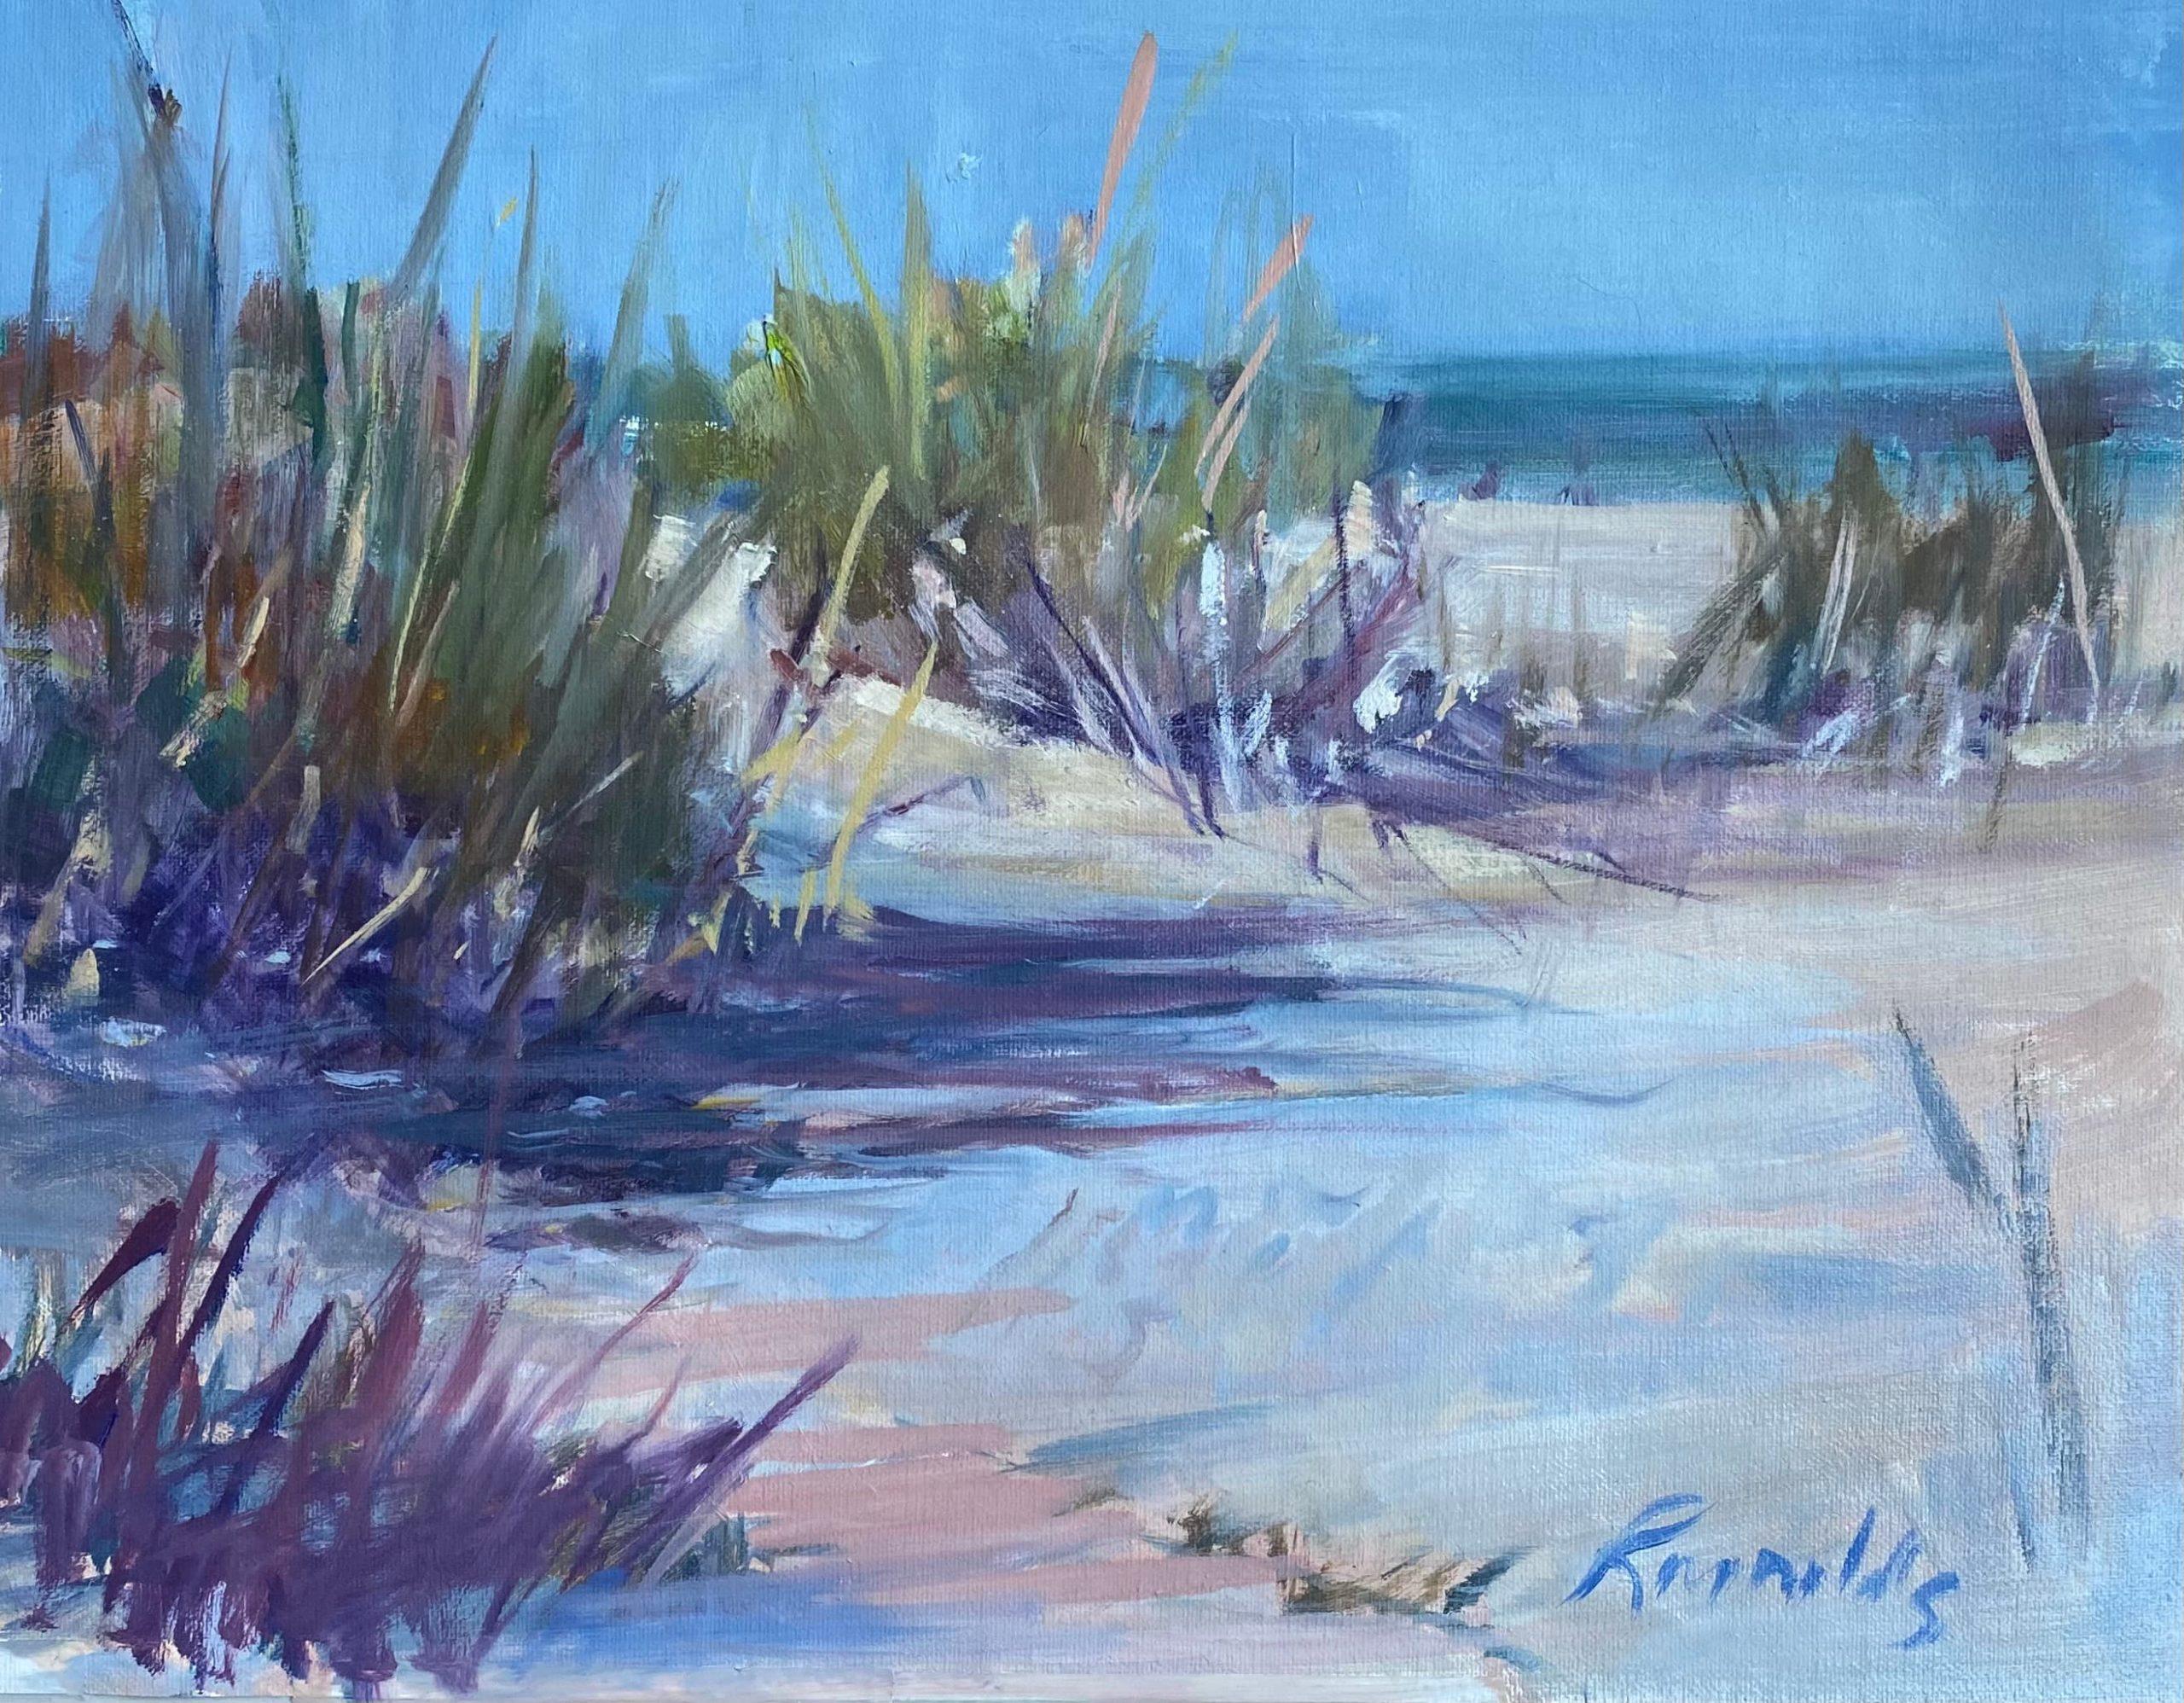 Beach Grasses and Shadows by Sara Jane Reynolds.